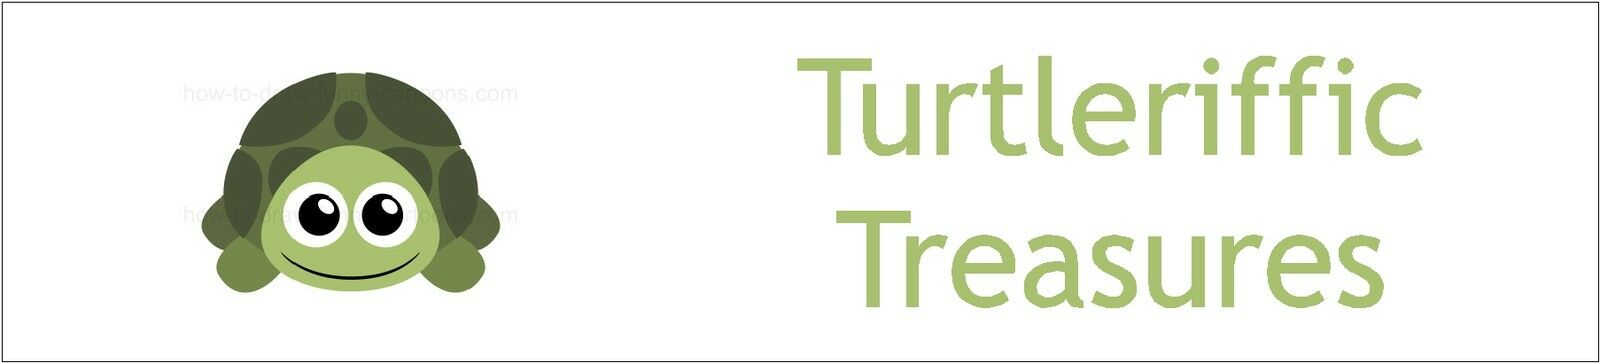 Turtleriffic Treasures